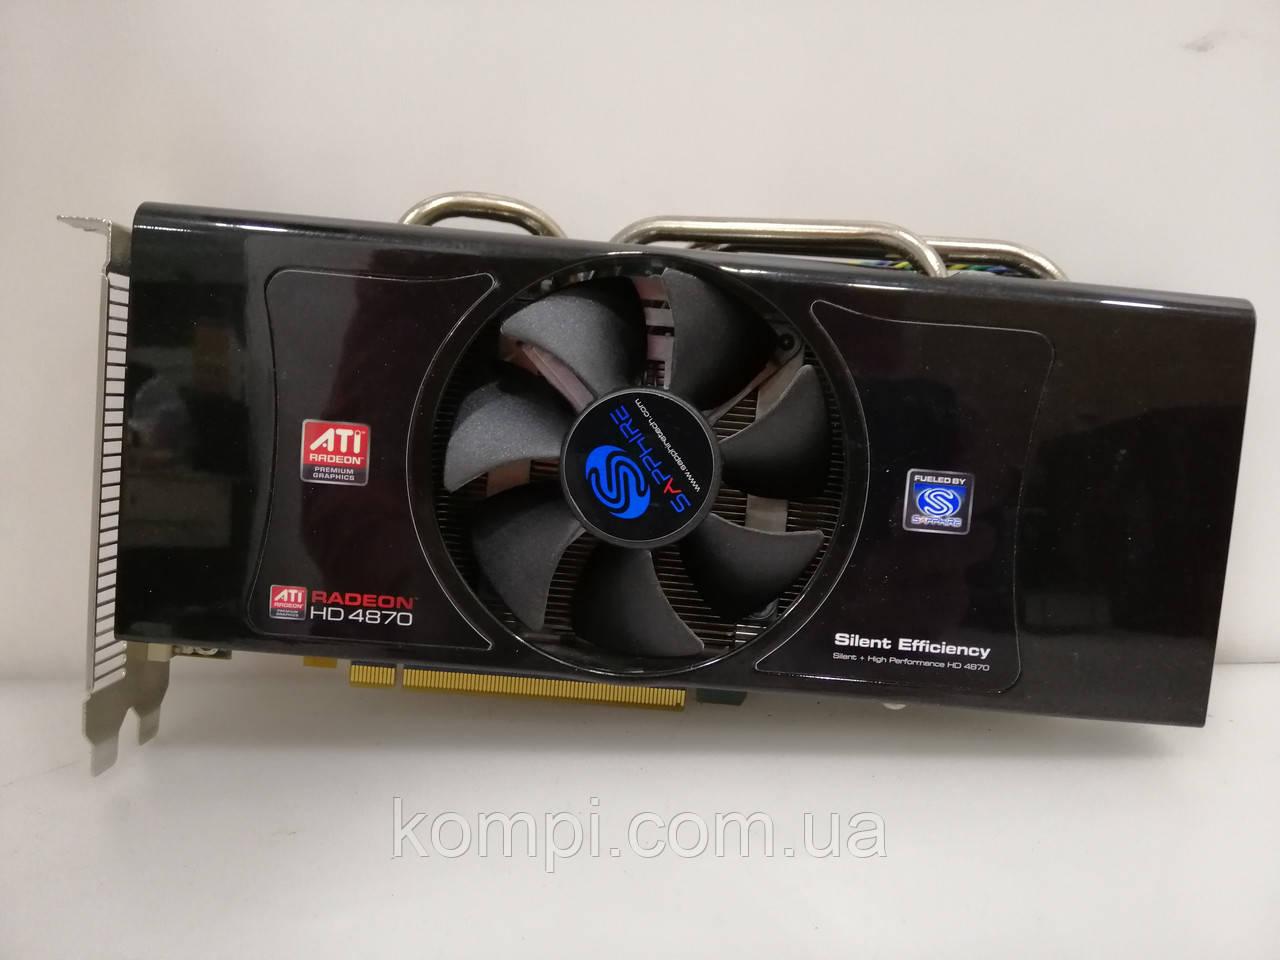 Видеокарта ATI RADEON HD 4870 512mb PCI-E